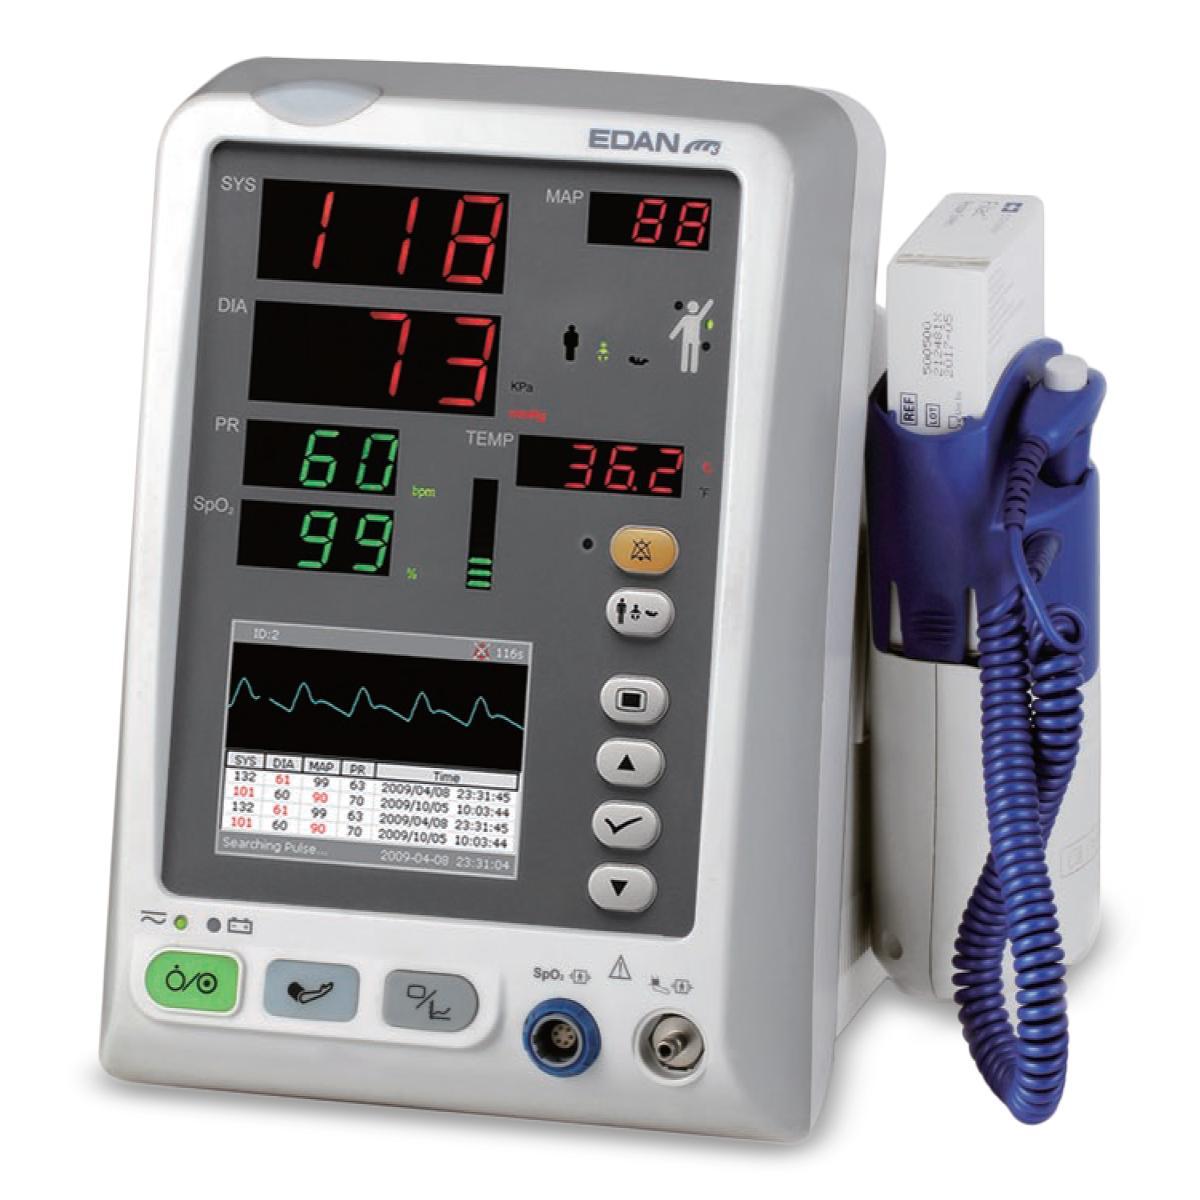 Edan M3a Vital Signs Monitors Monitor Bp Spo2 Oral Temp